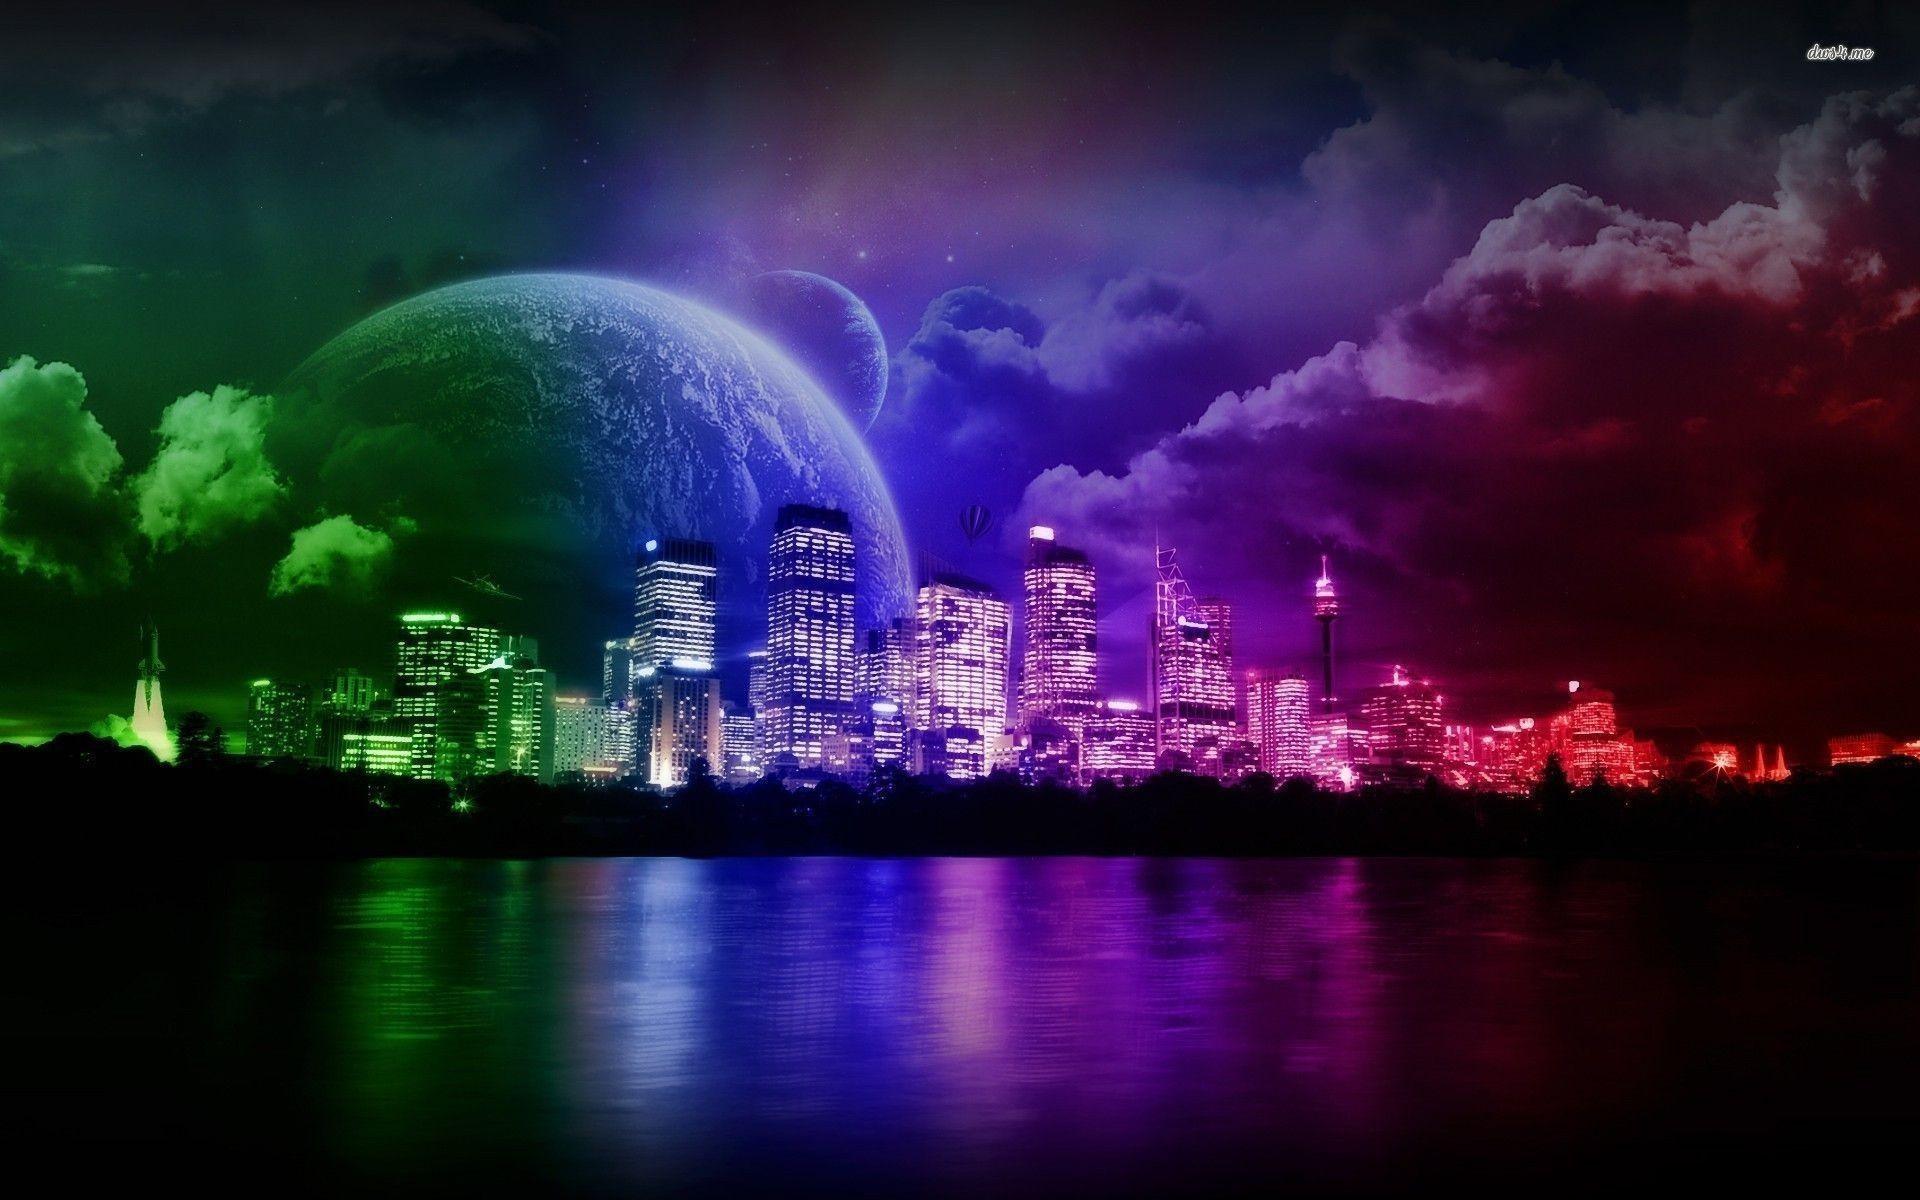 Neon Wallpapers For Desktop Background 77 Images